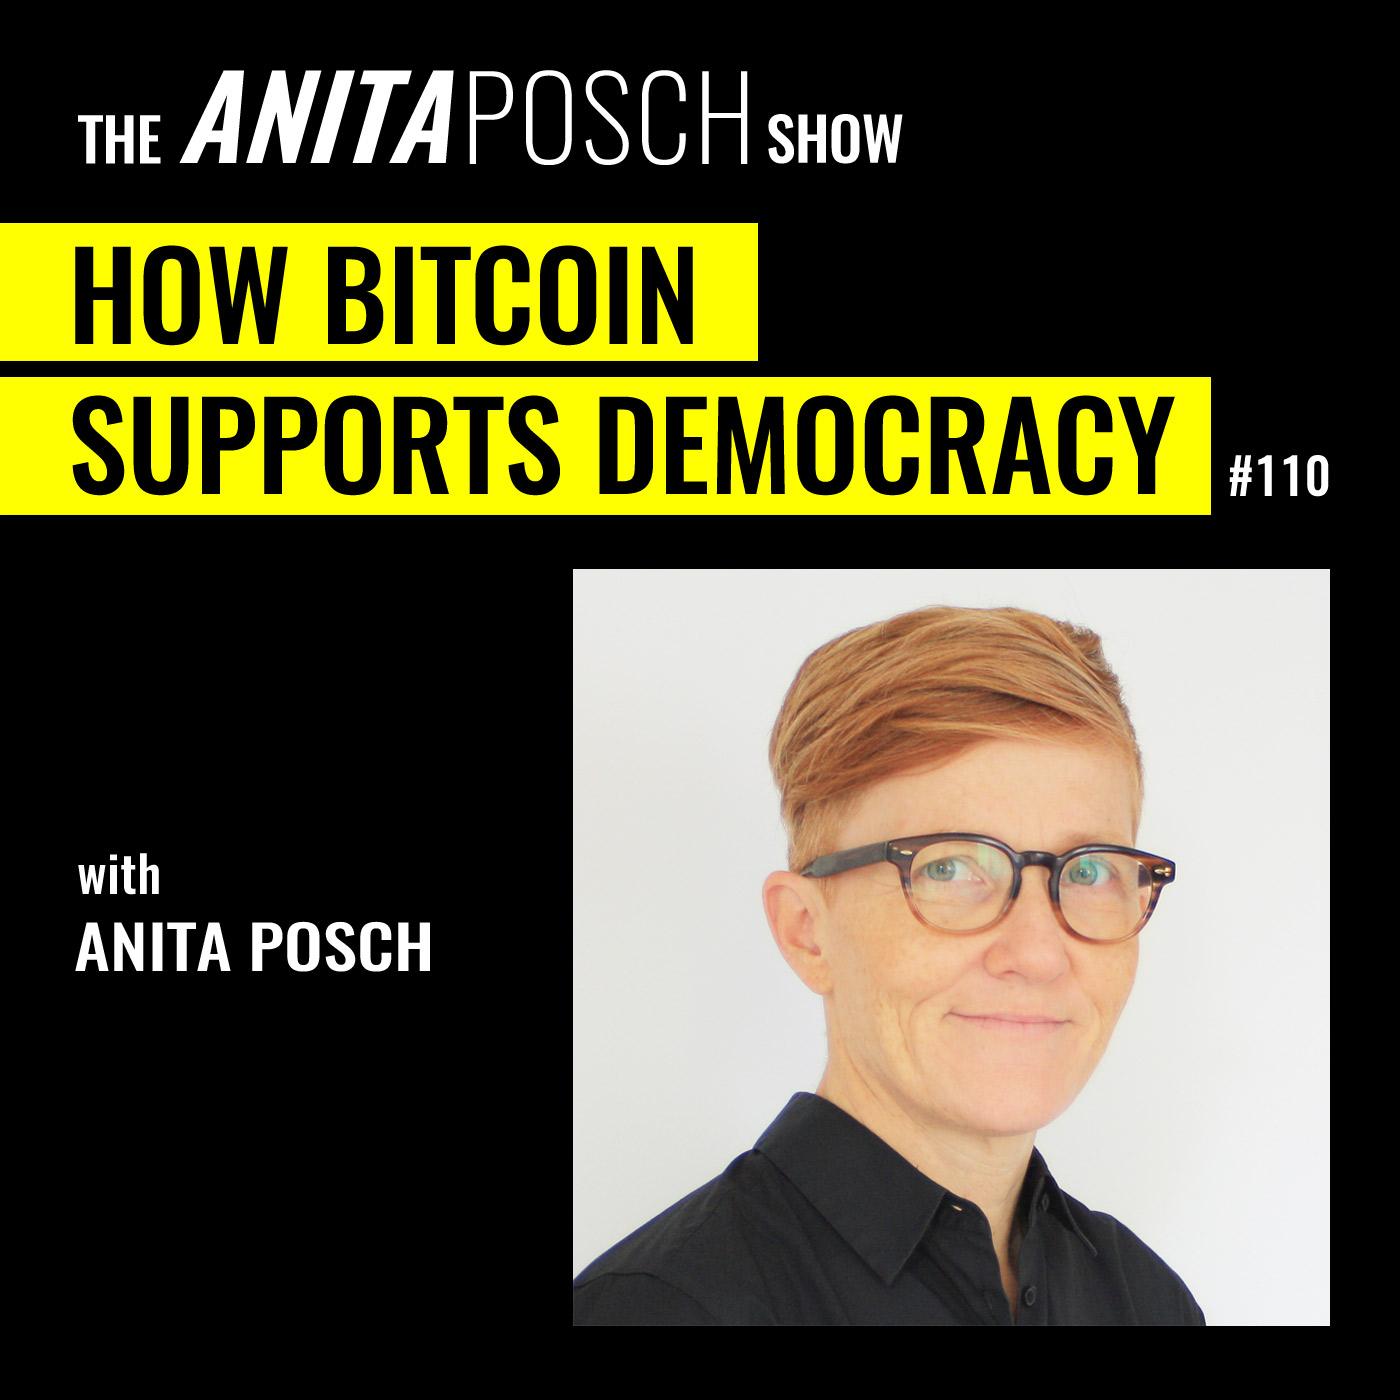 Anita Posch: How Bitcoin Supports Democracy